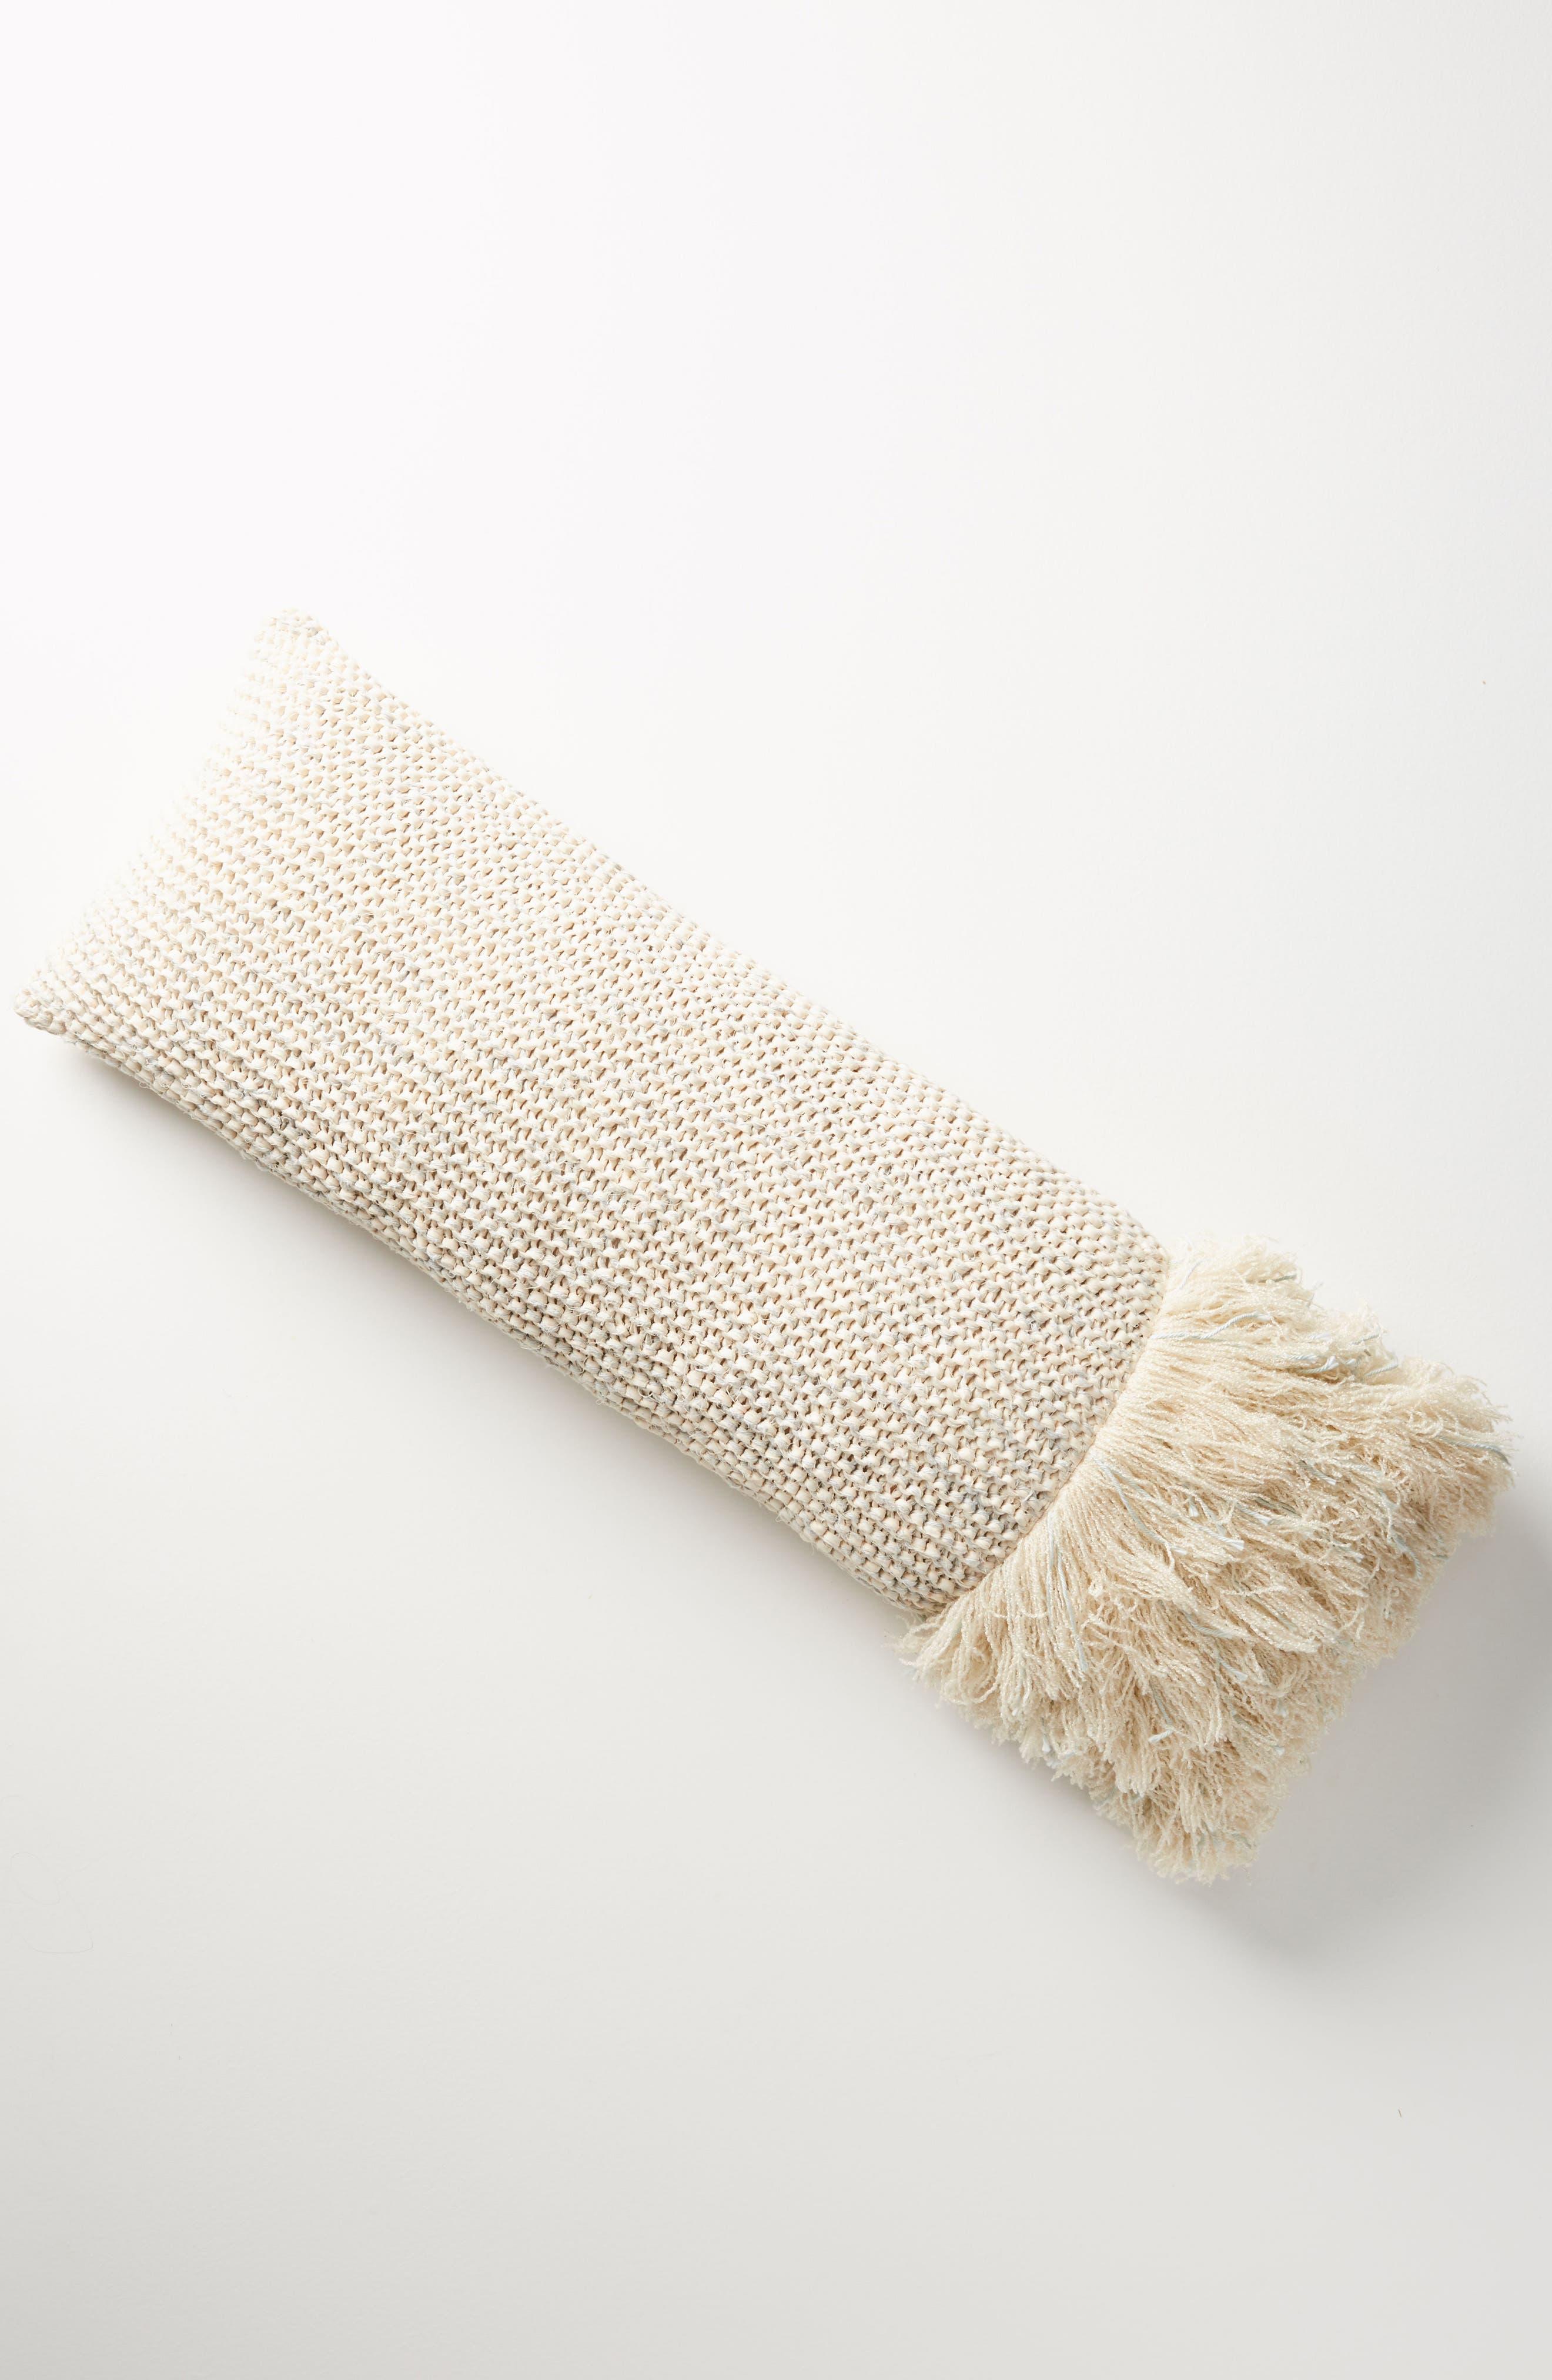 Fringed Waffleknit Pillow,                             Alternate thumbnail 3, color,                             422